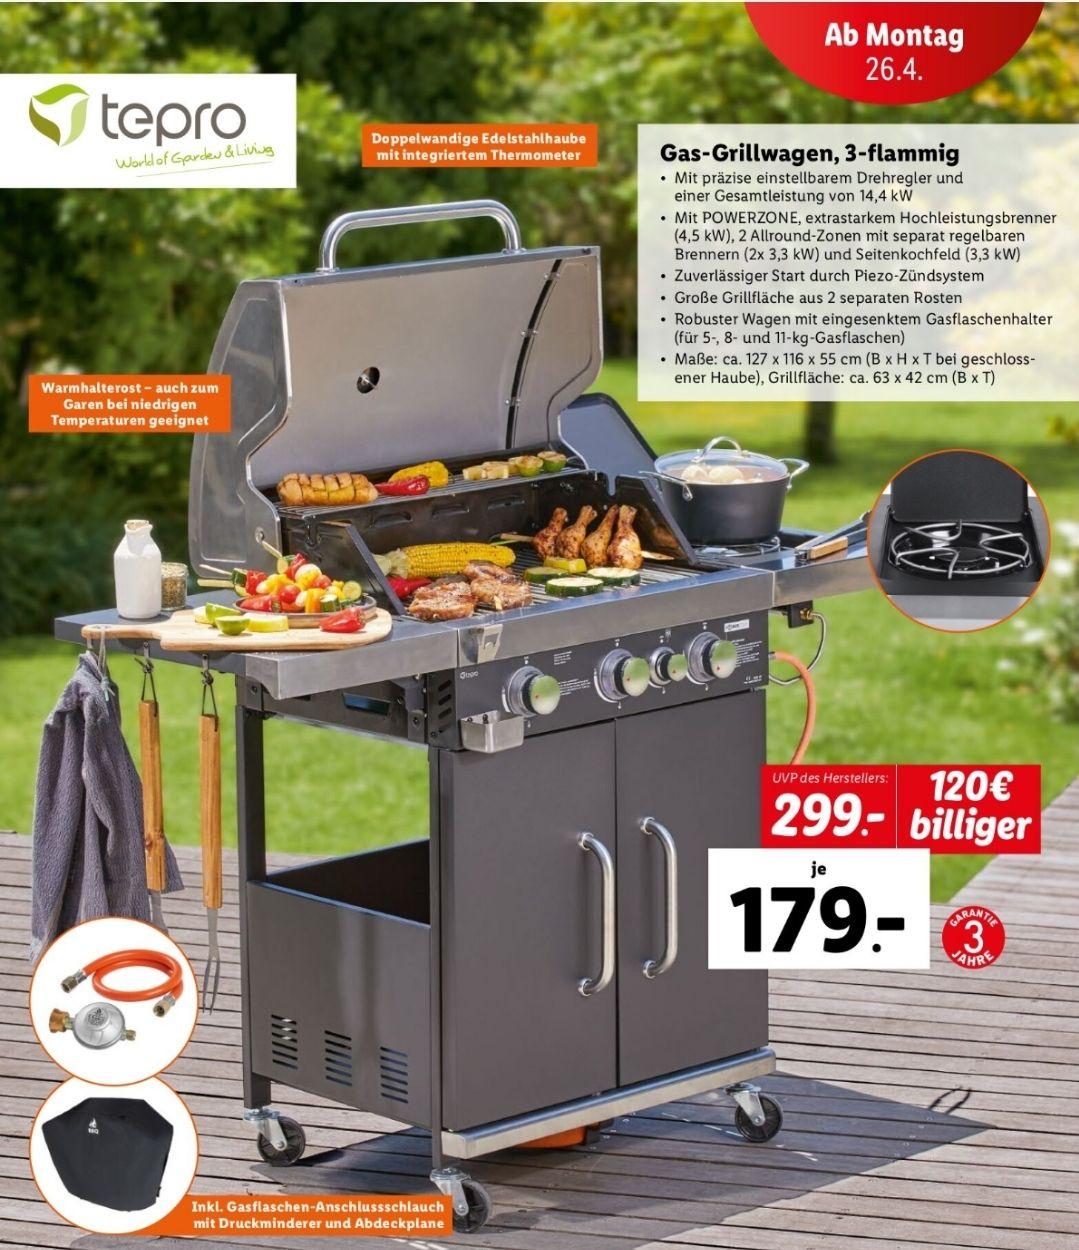 Tepro Gas-Grillwagen, 3-flammig